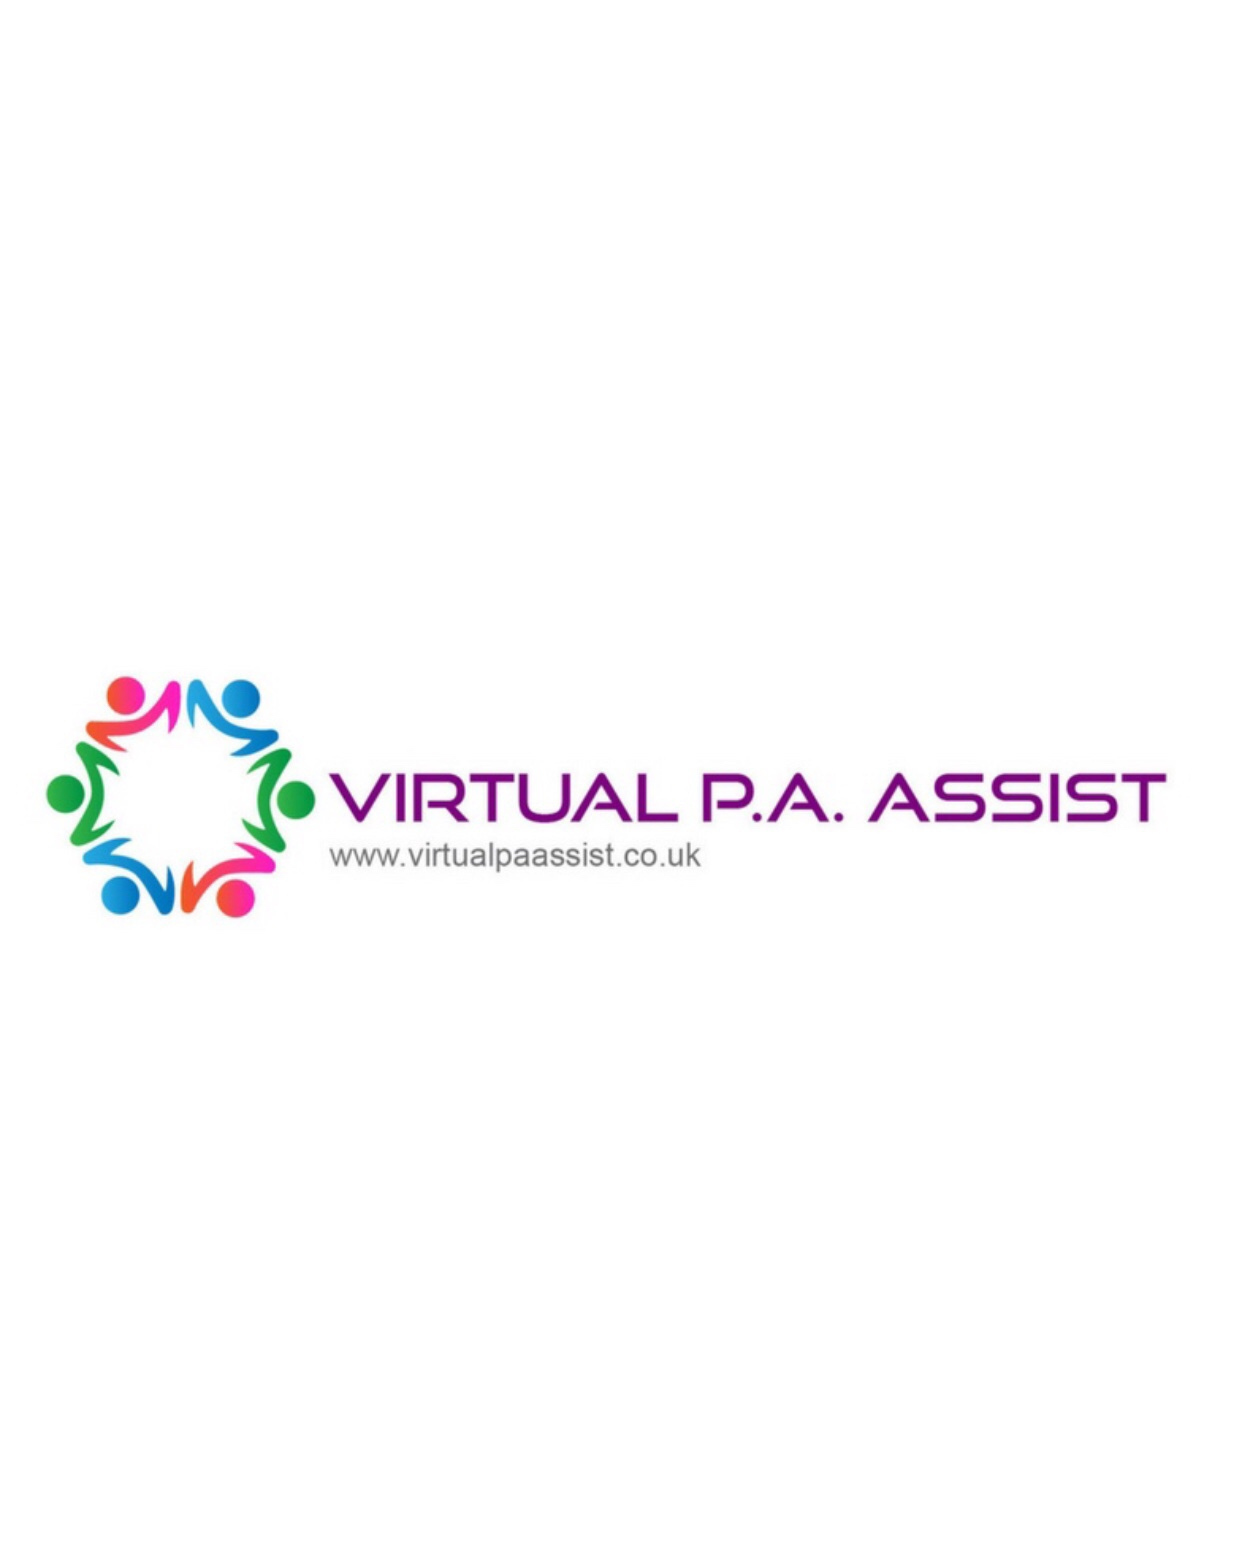 Virtual PA Assist